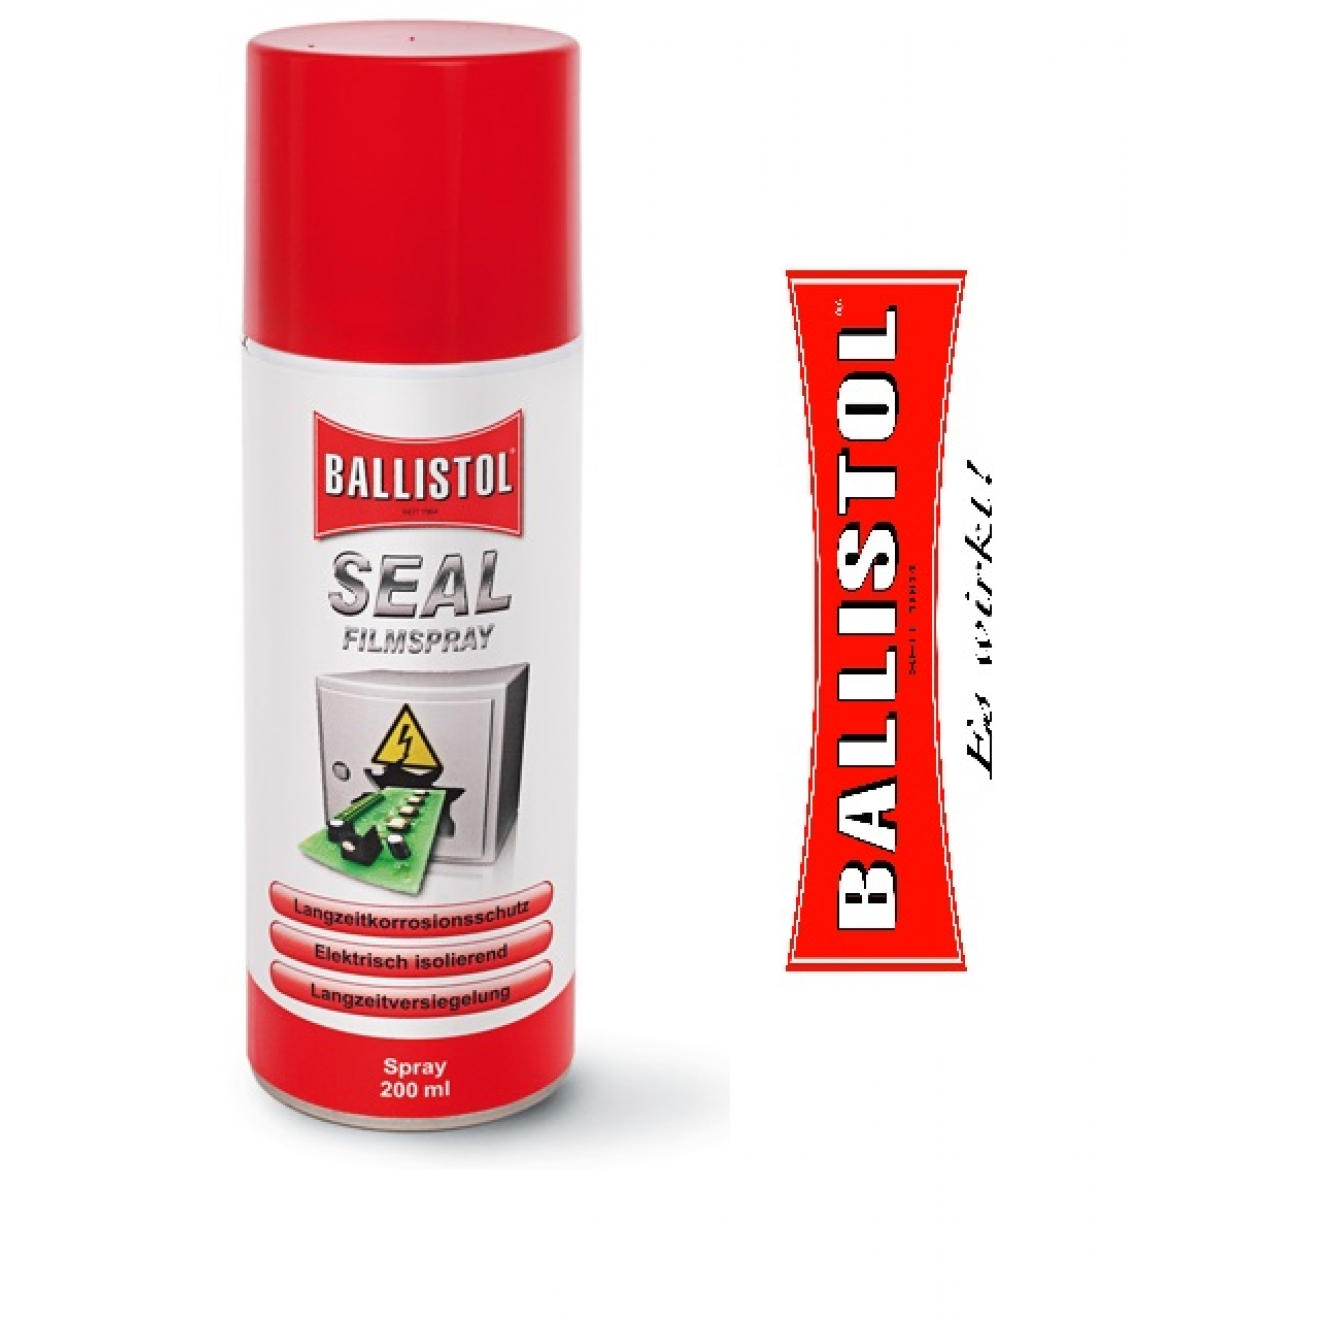 ballistol seal film 200 spray. Black Bedroom Furniture Sets. Home Design Ideas